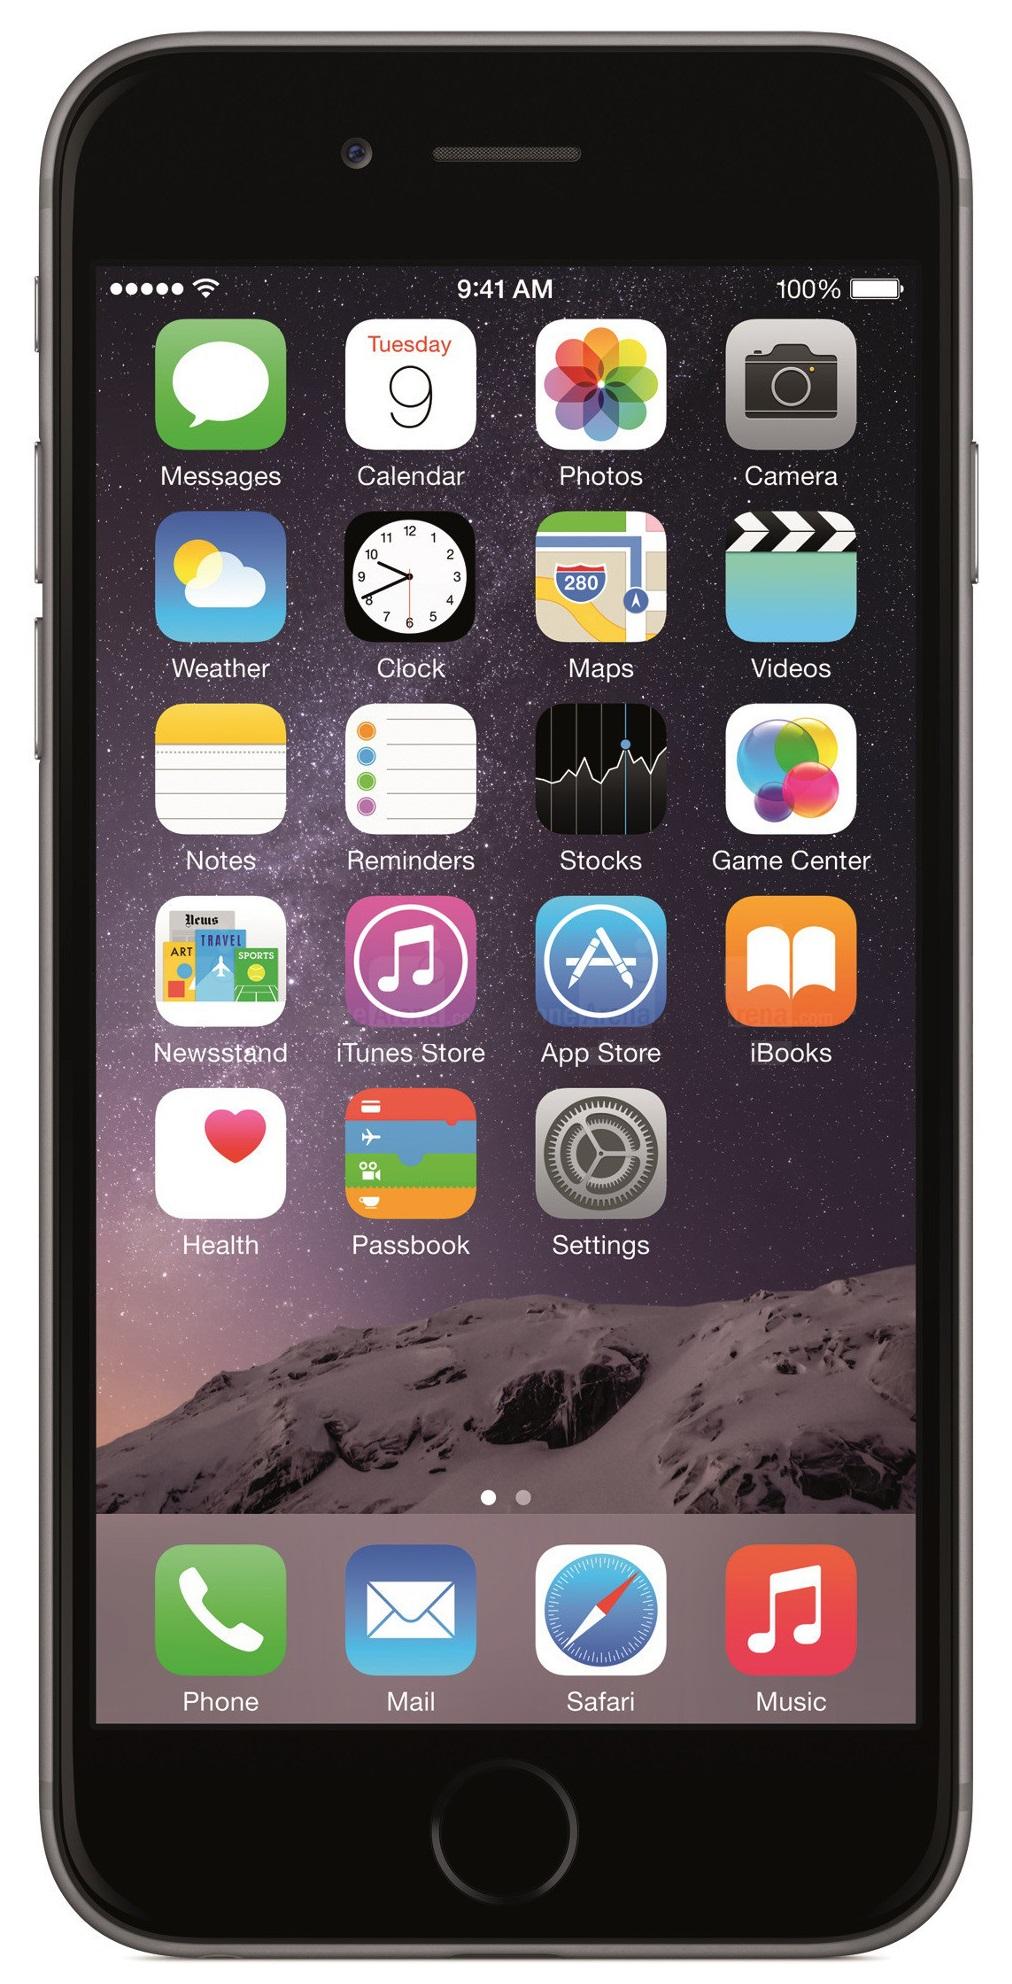 apple iphone 6 128gb unlocked gsm 4g lte ios 8 dual core. Black Bedroom Furniture Sets. Home Design Ideas